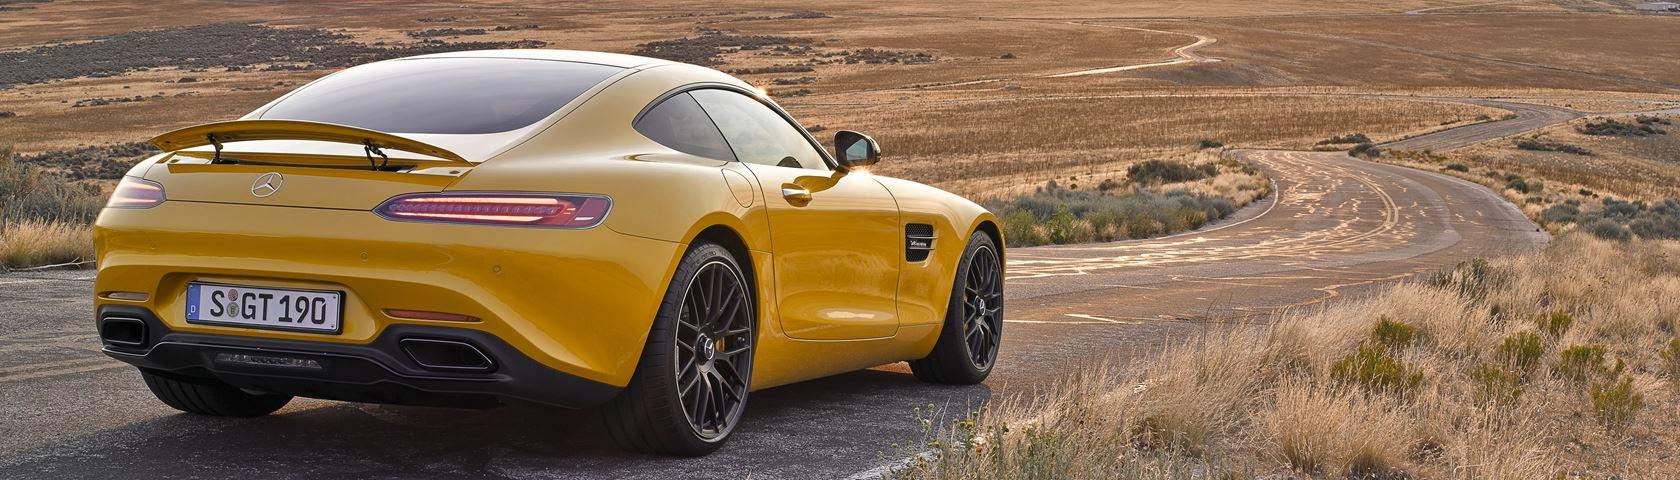 Mercedes Benz AMG-GT S